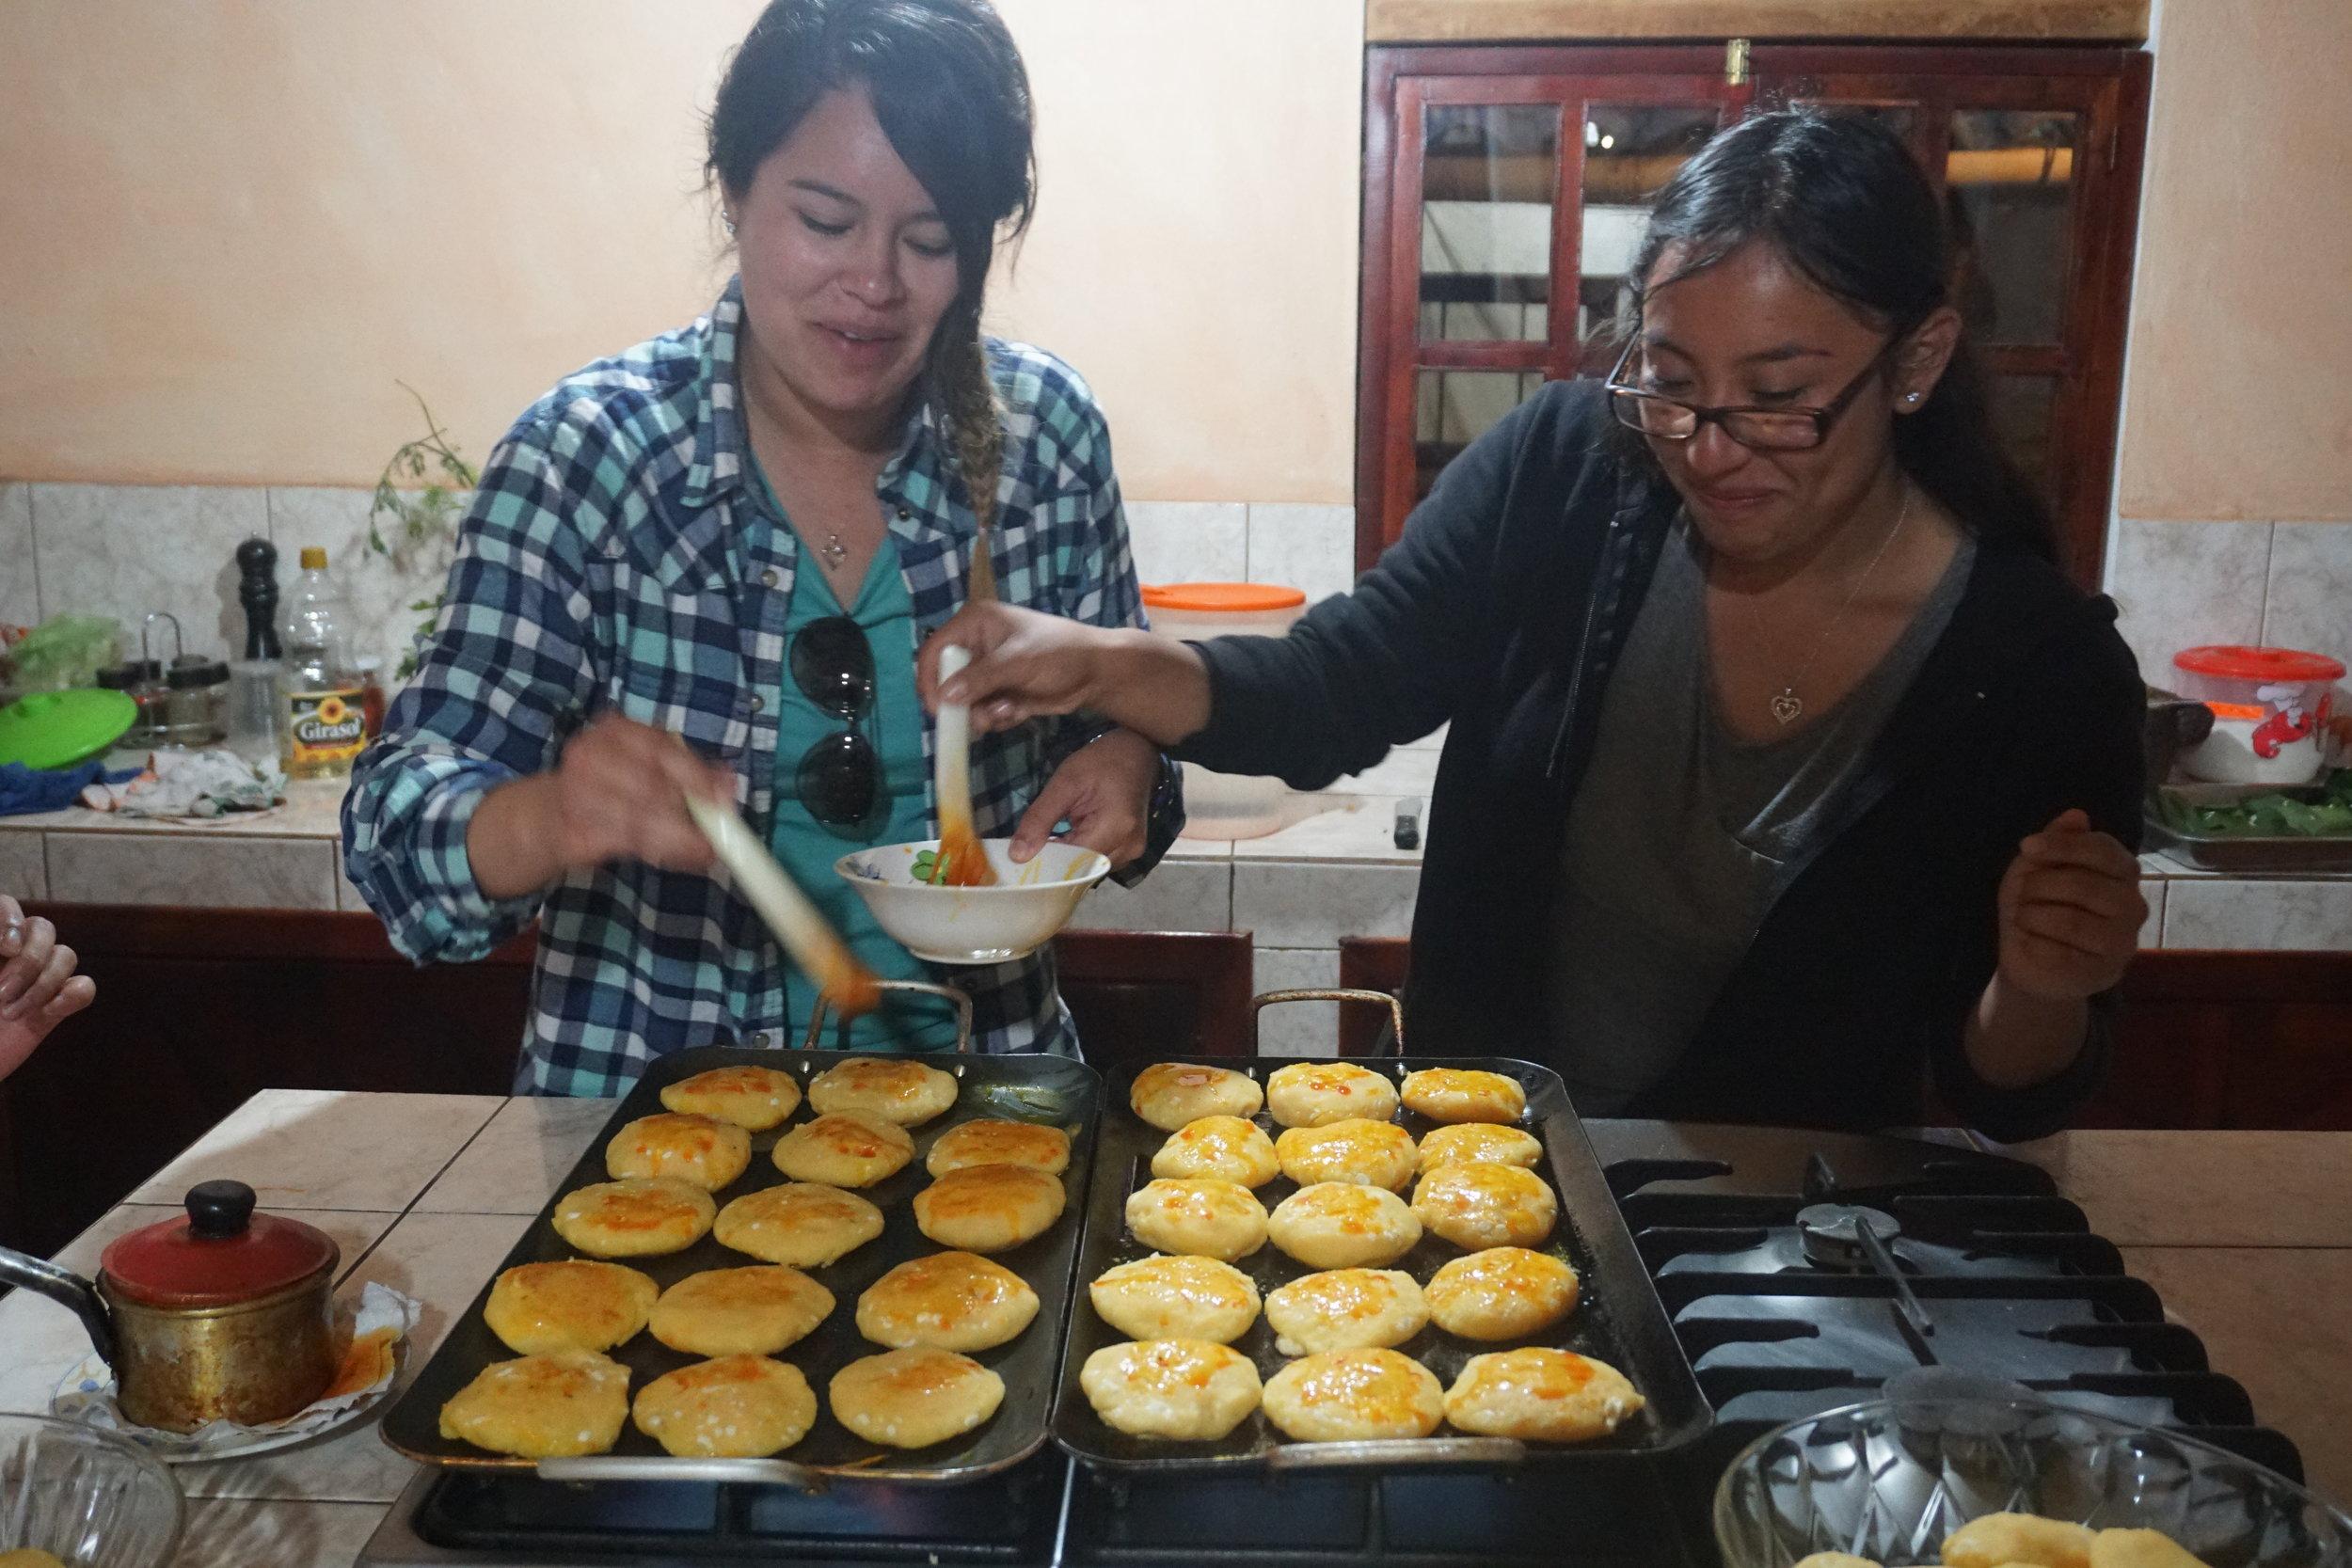 Maria and Viviana hacen comida de Ecuador.